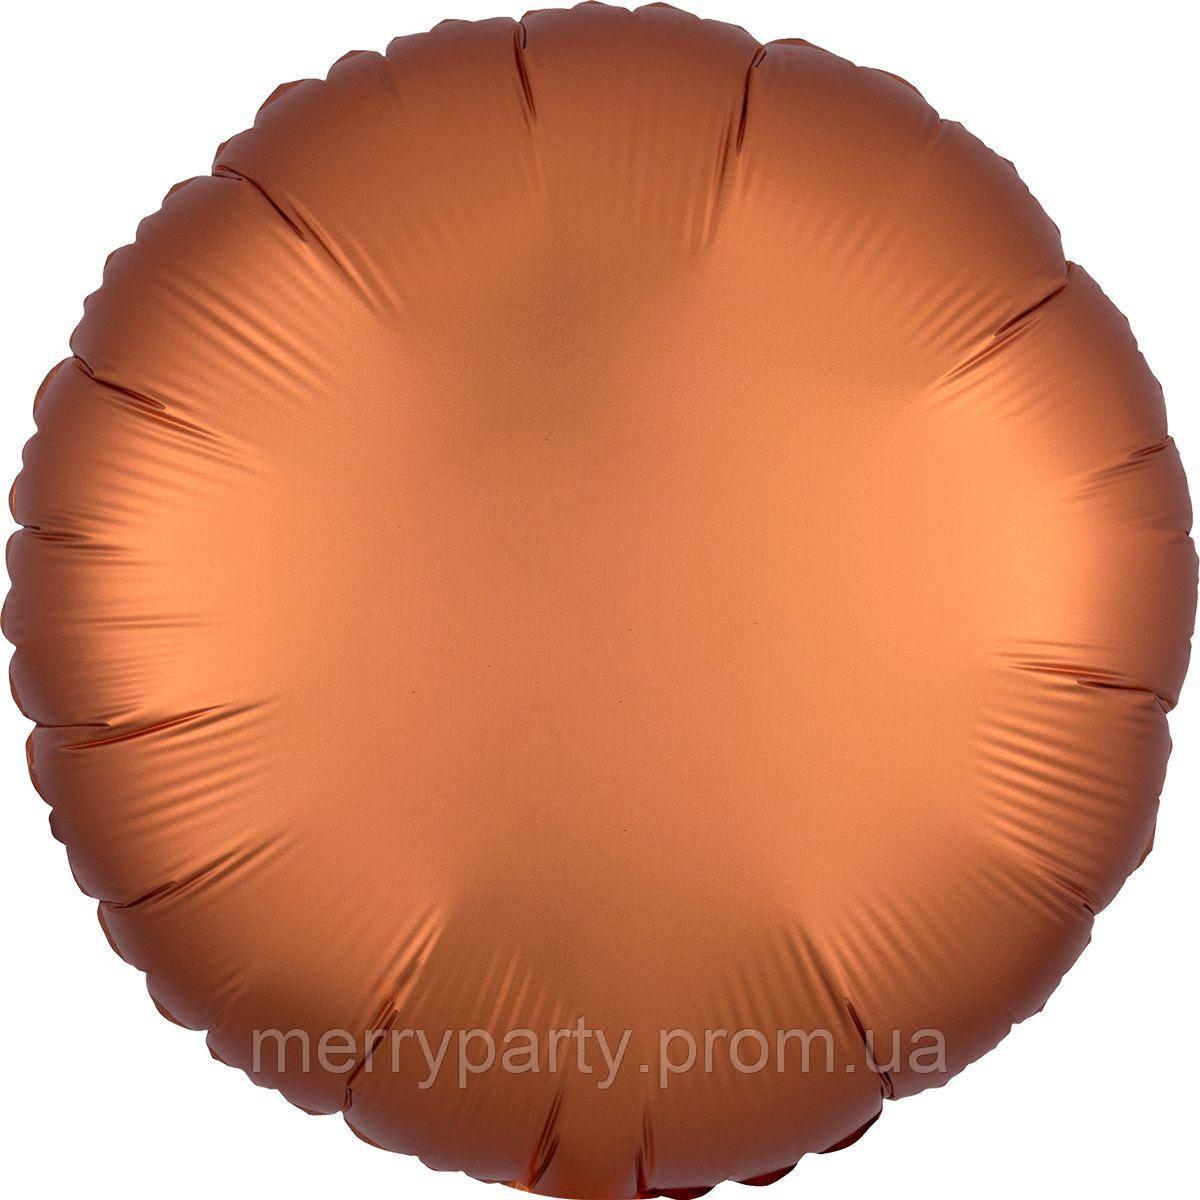 "18"" (45 см) Коло сатин бронза Anagram США куля фольгований"